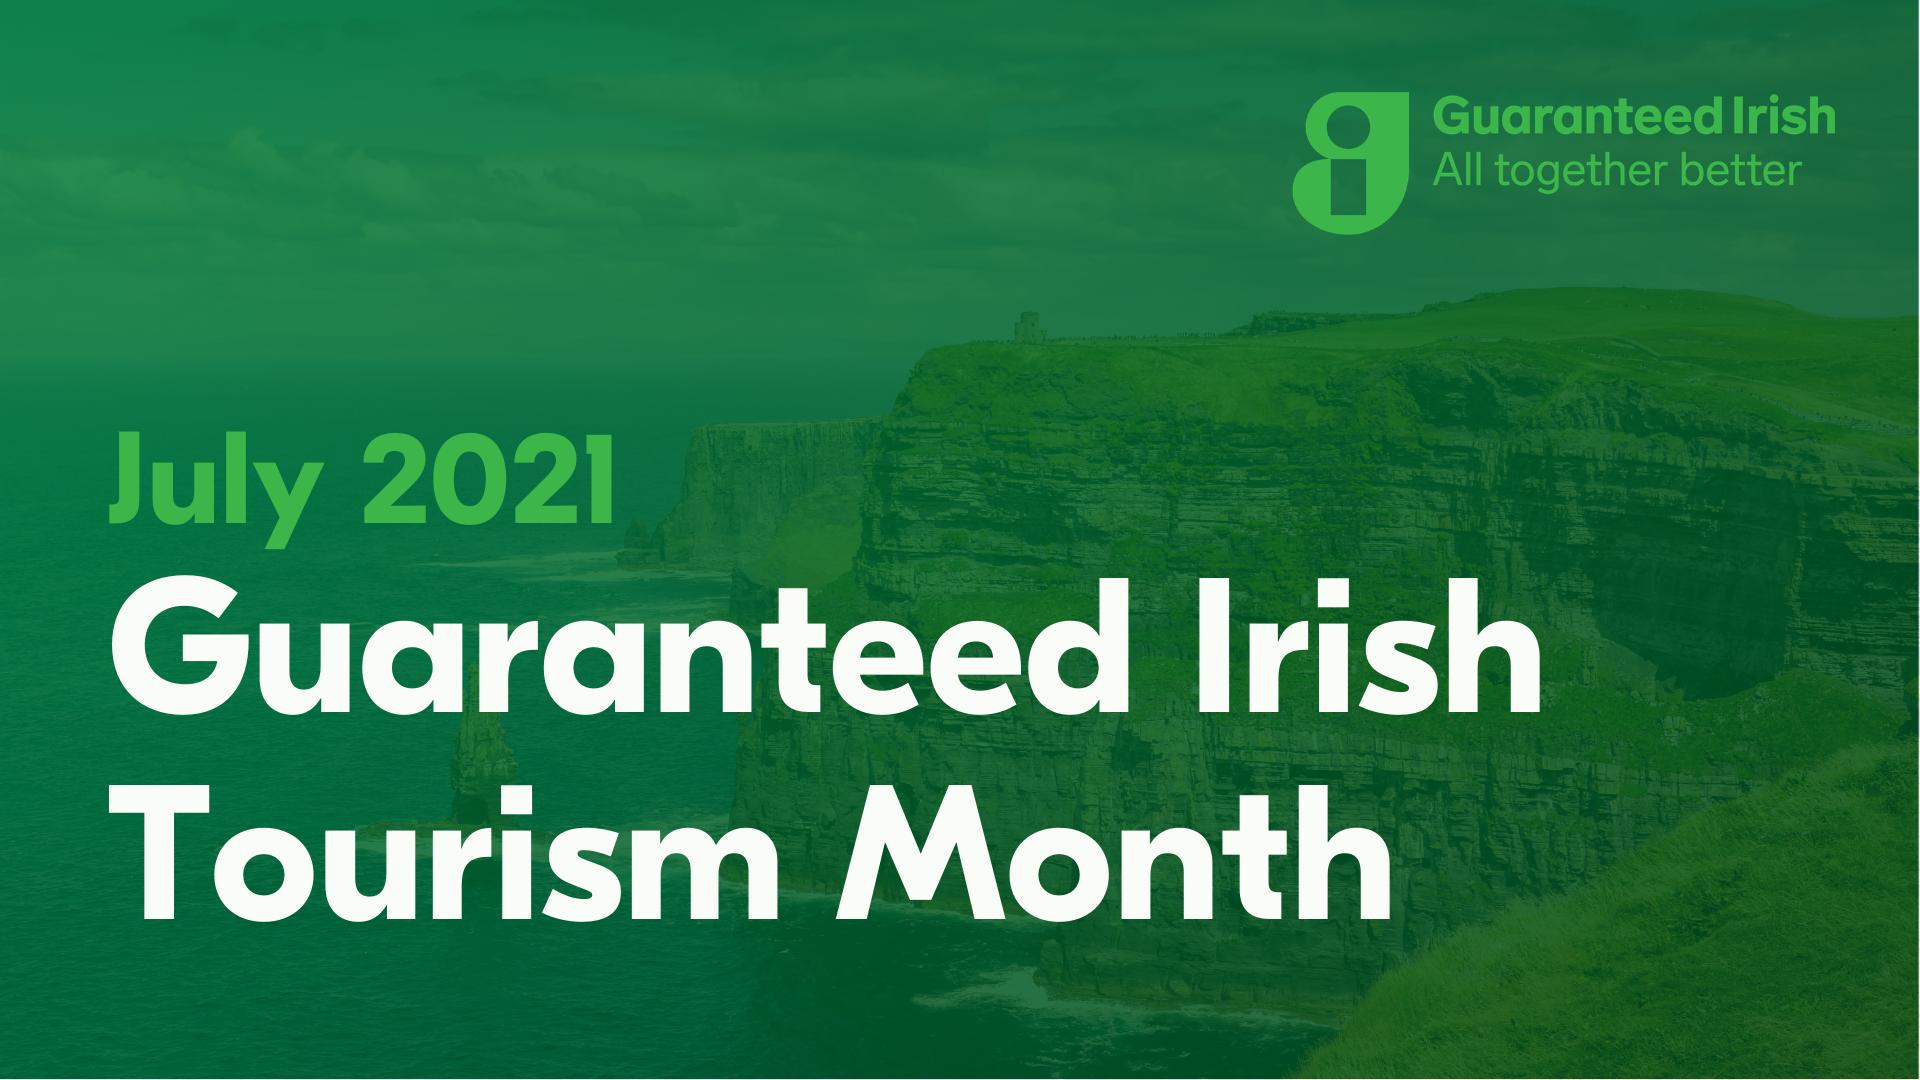 Tourism Month